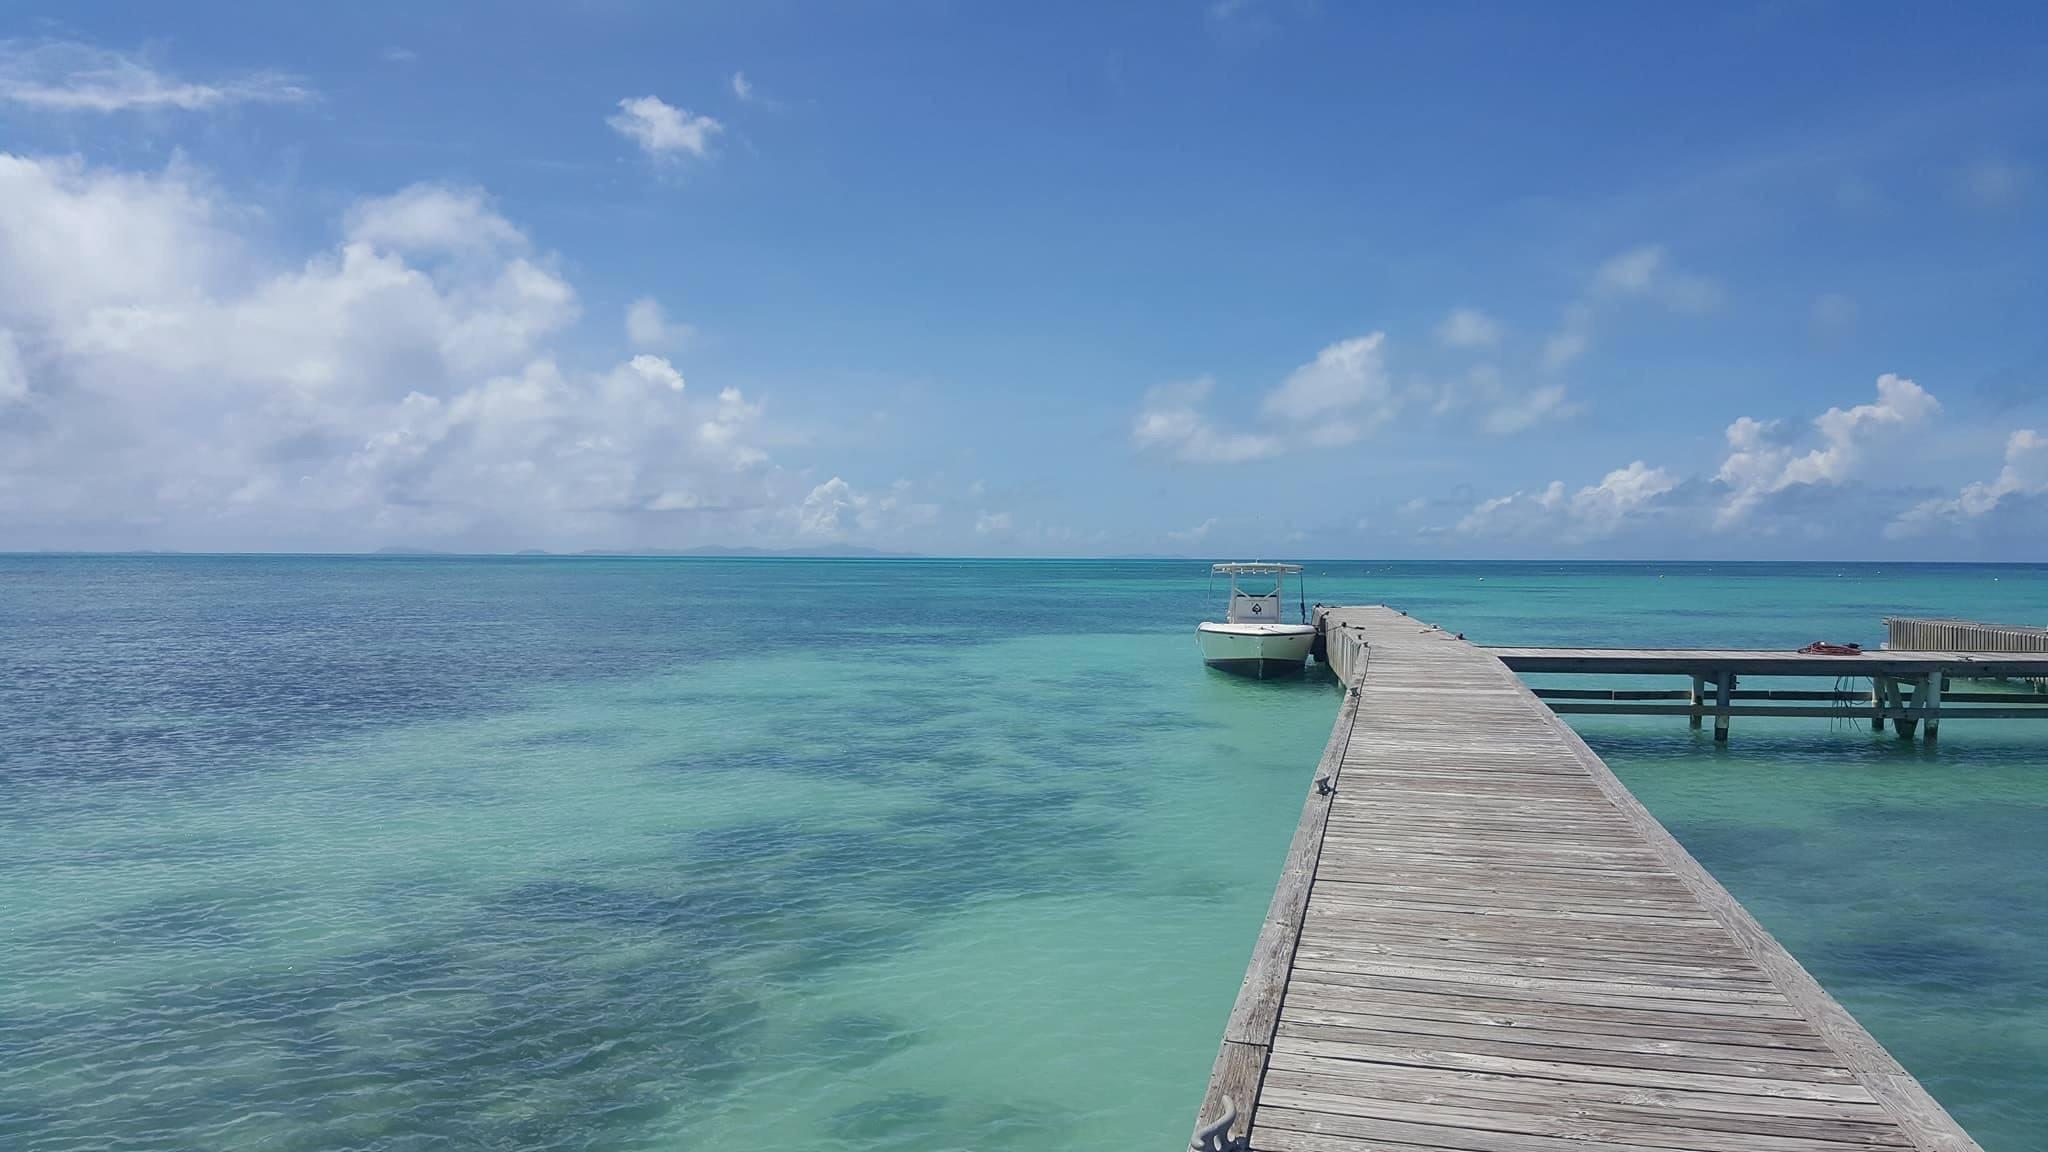 Dock in Anegada - photo by Virgin Motor Yachts